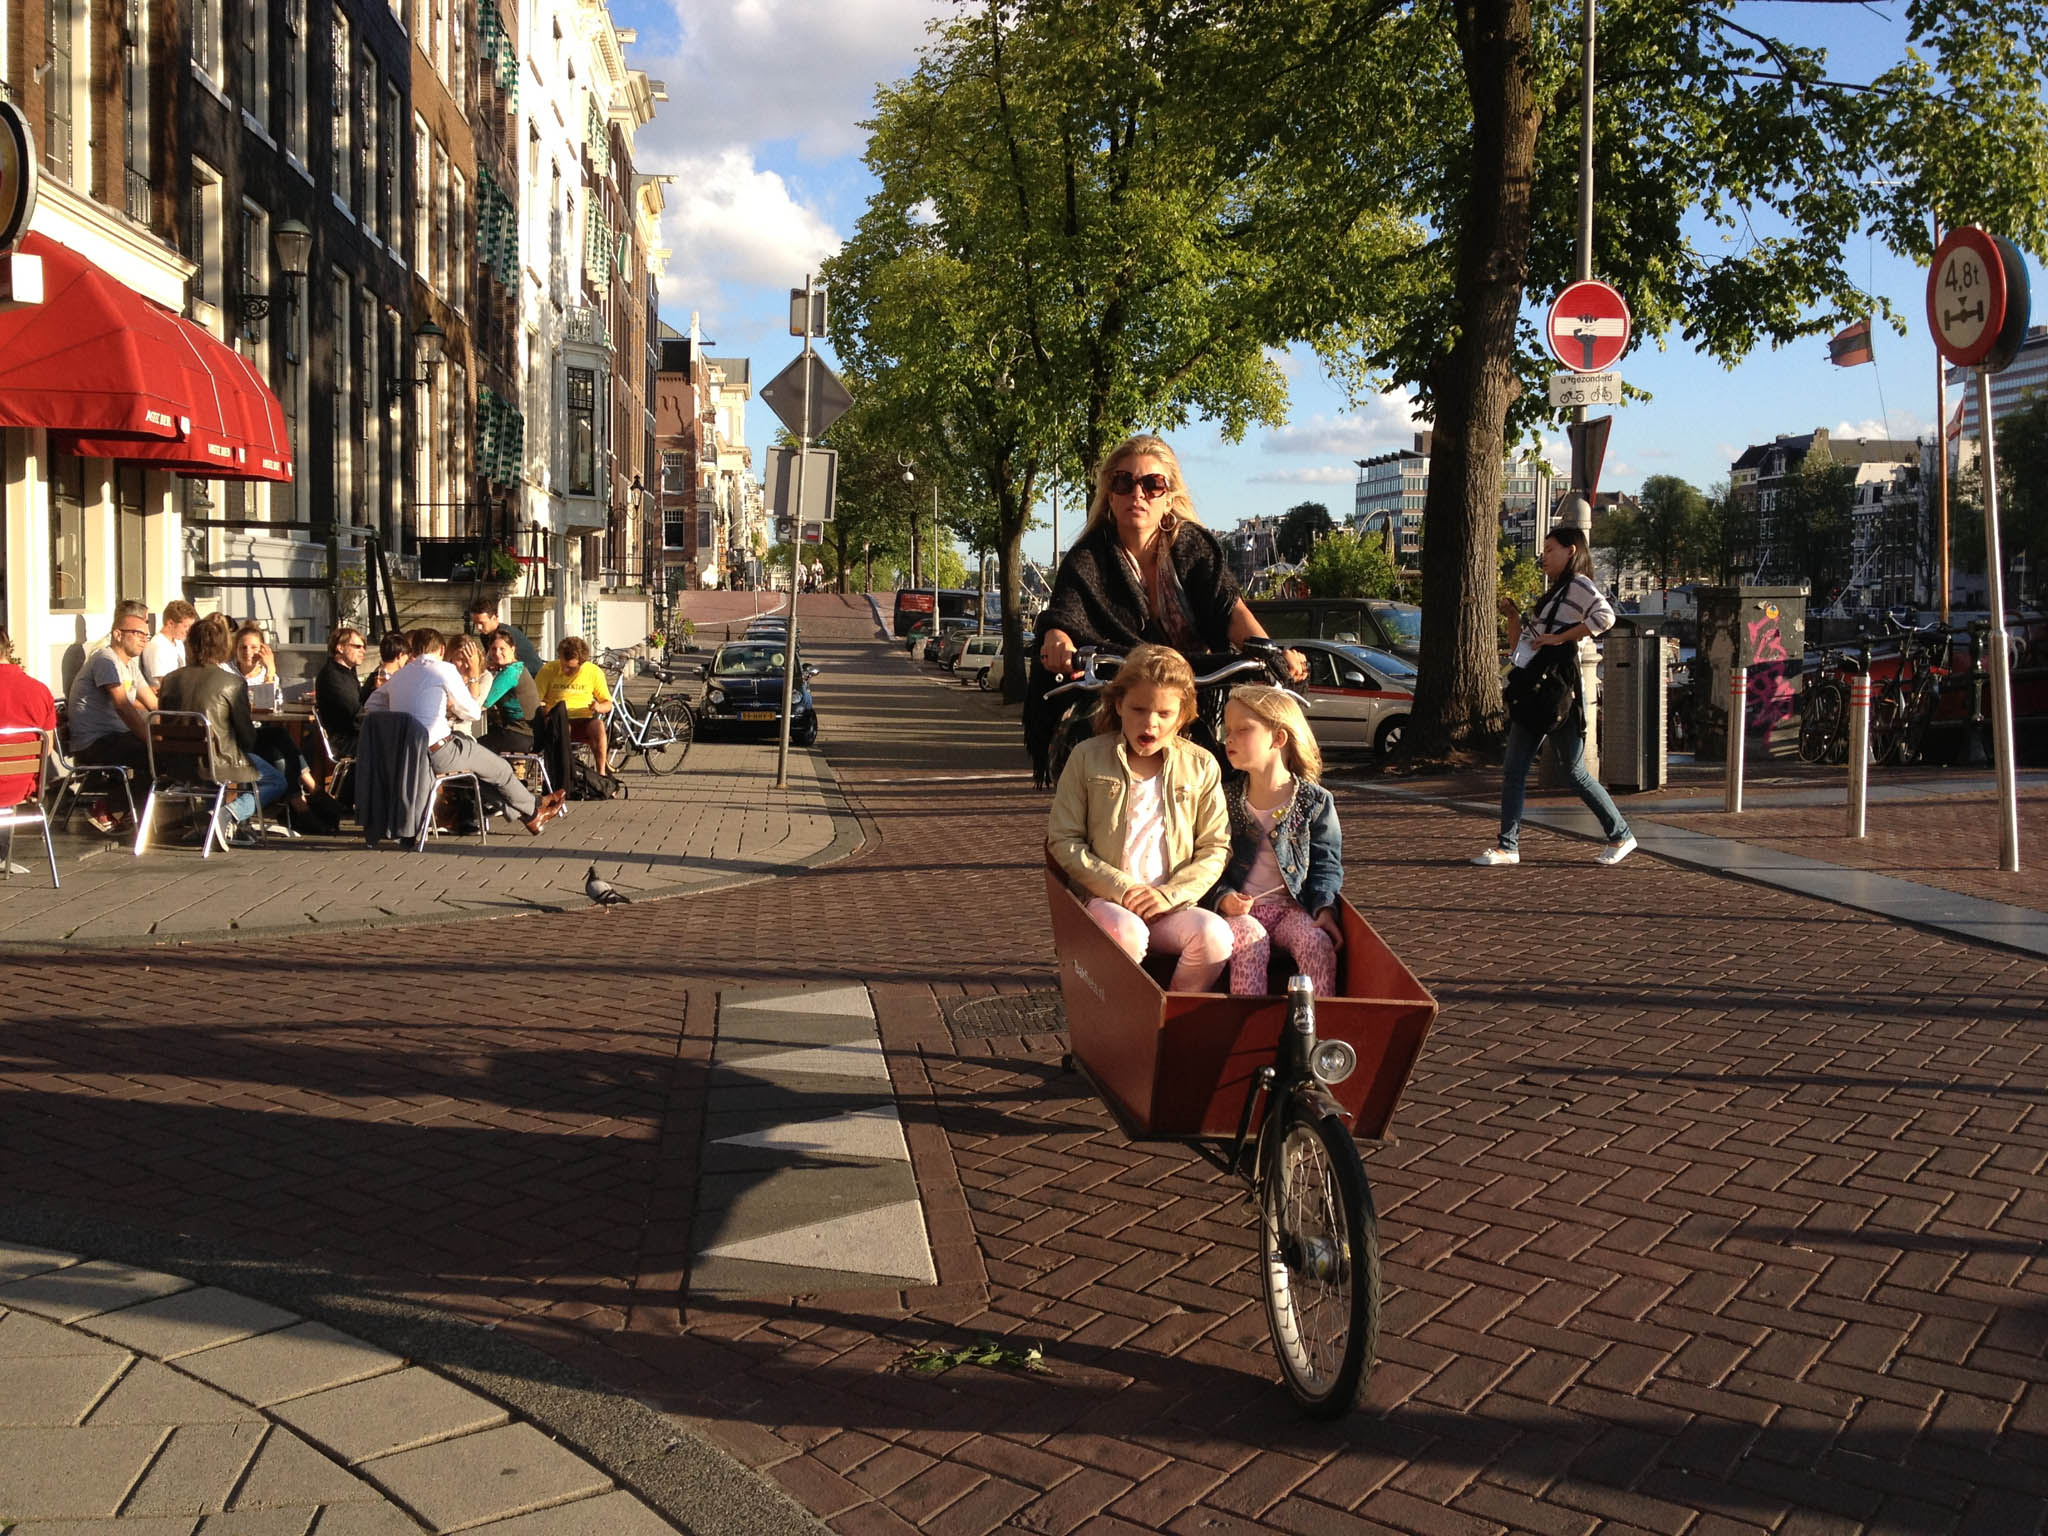 kids on a bike - 20130819